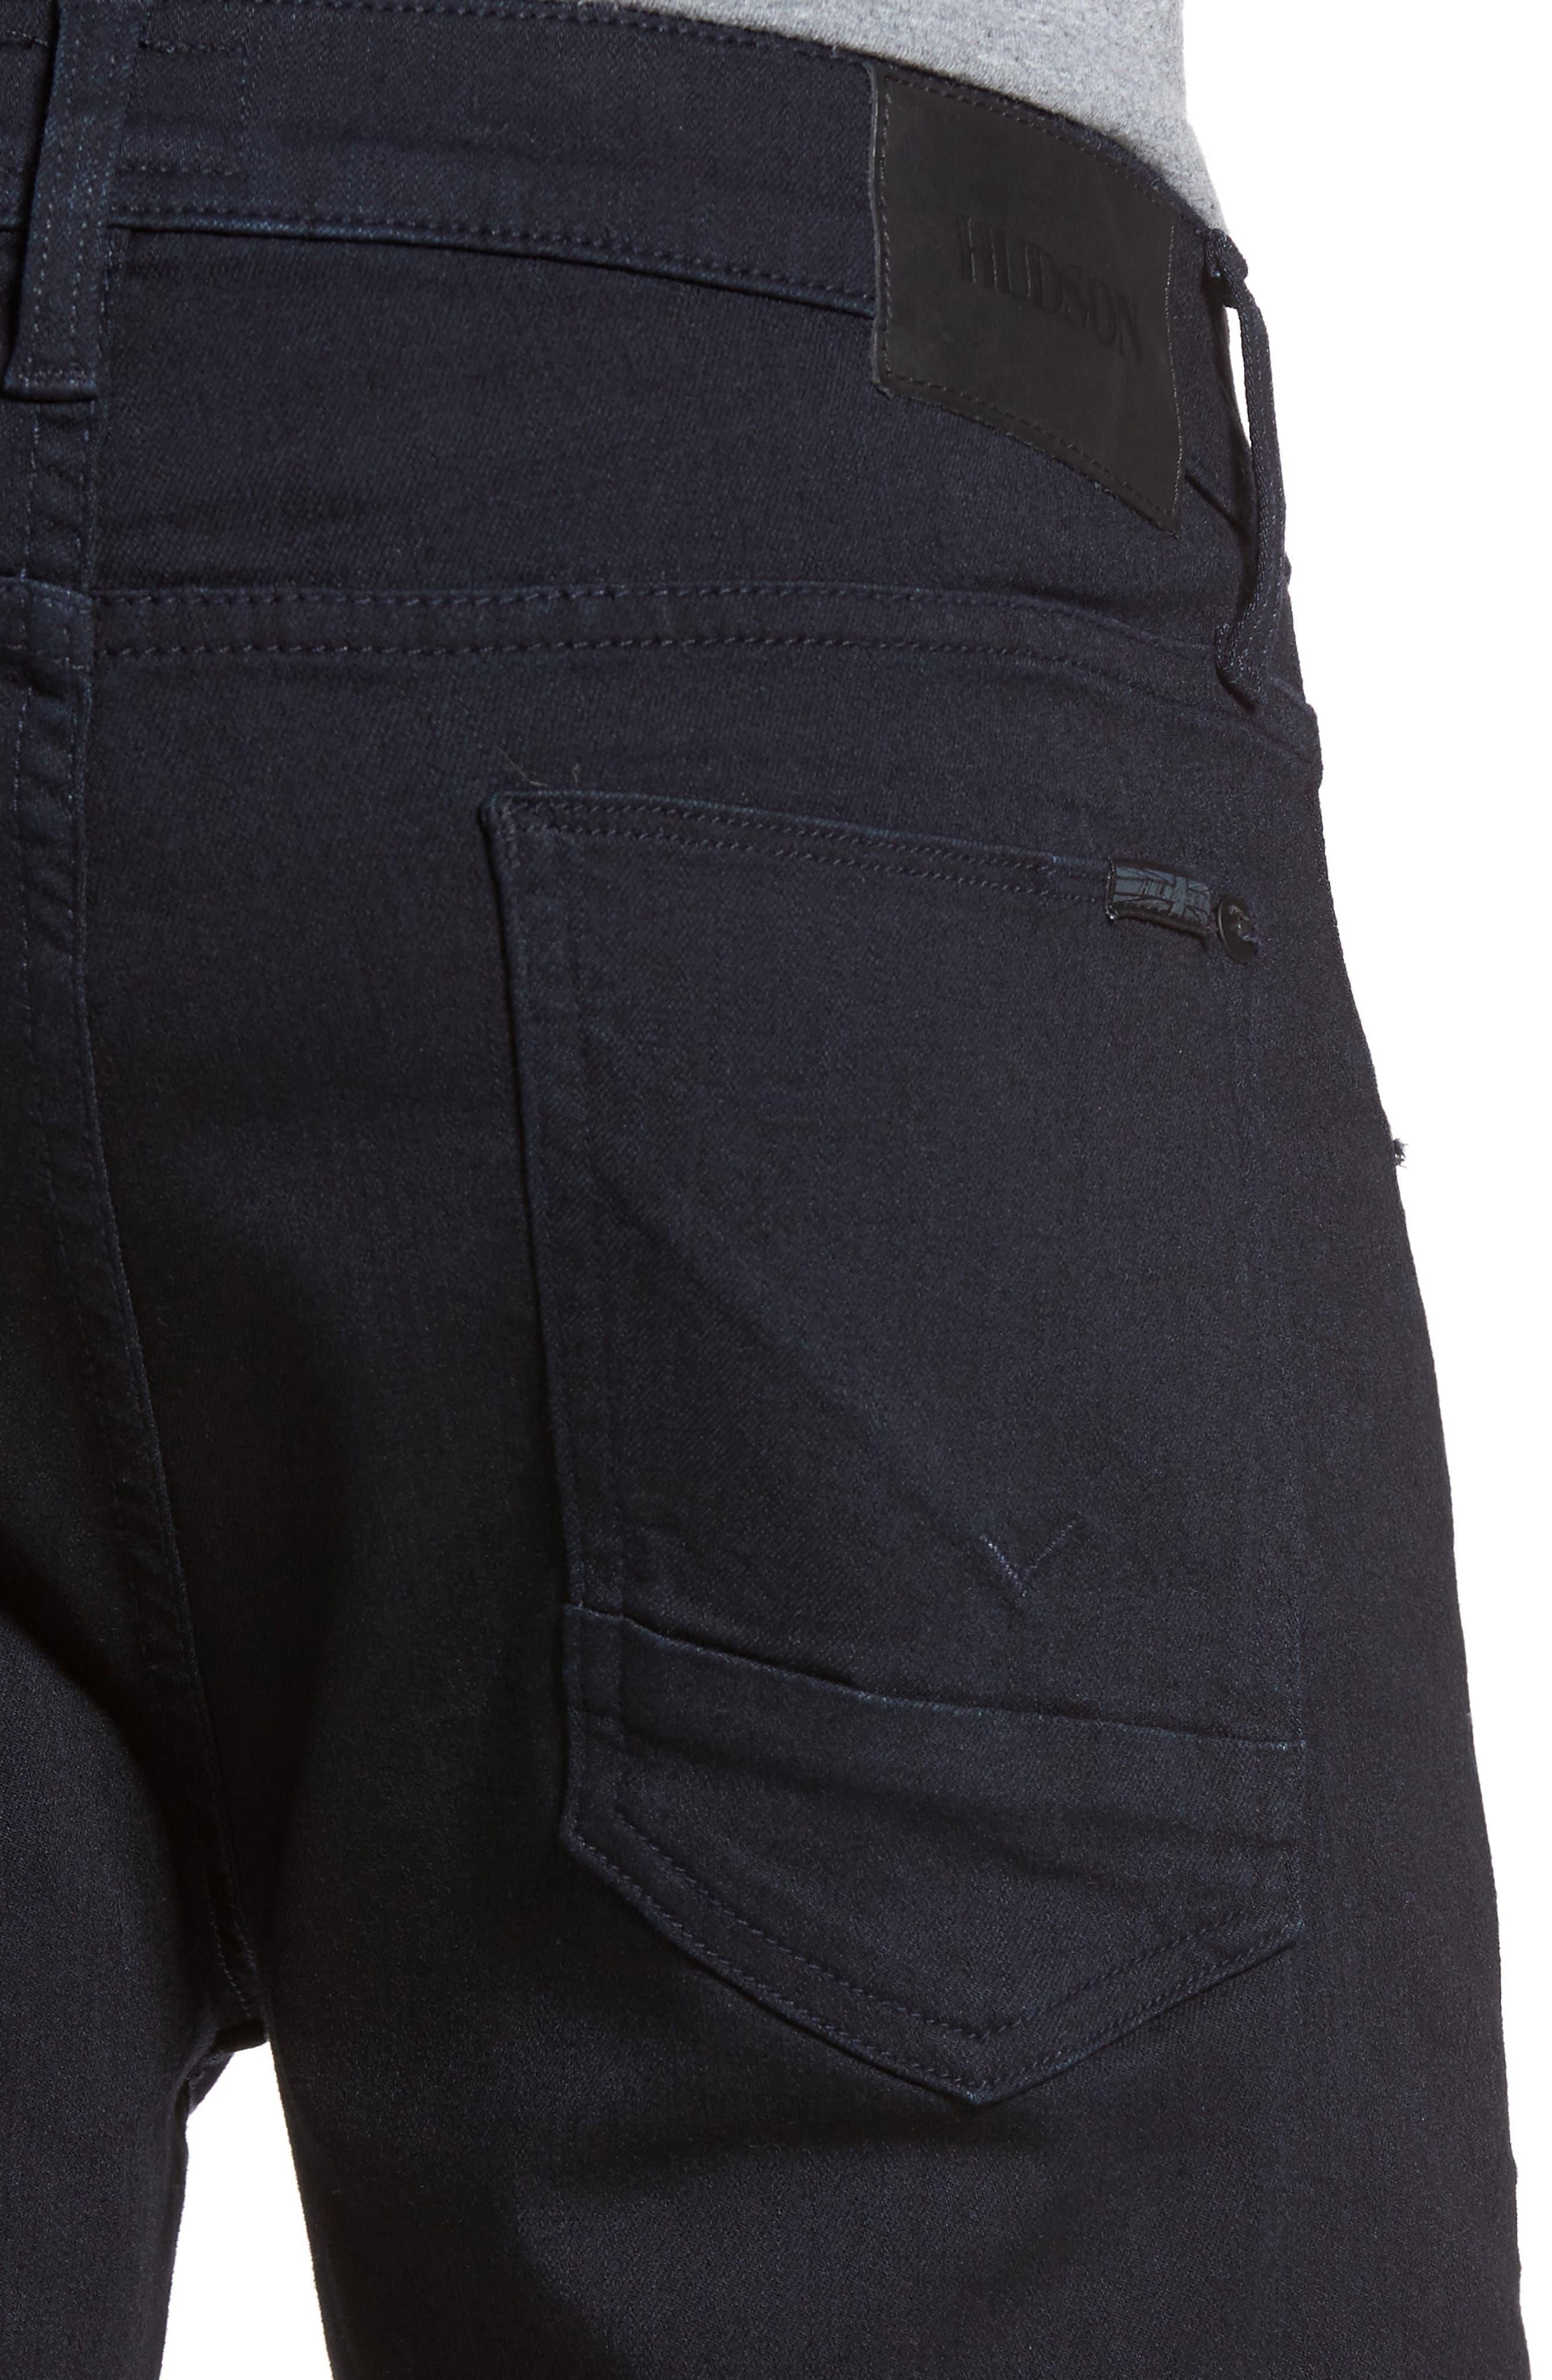 Blake Slim Fit Jeans,                             Alternate thumbnail 11, color,